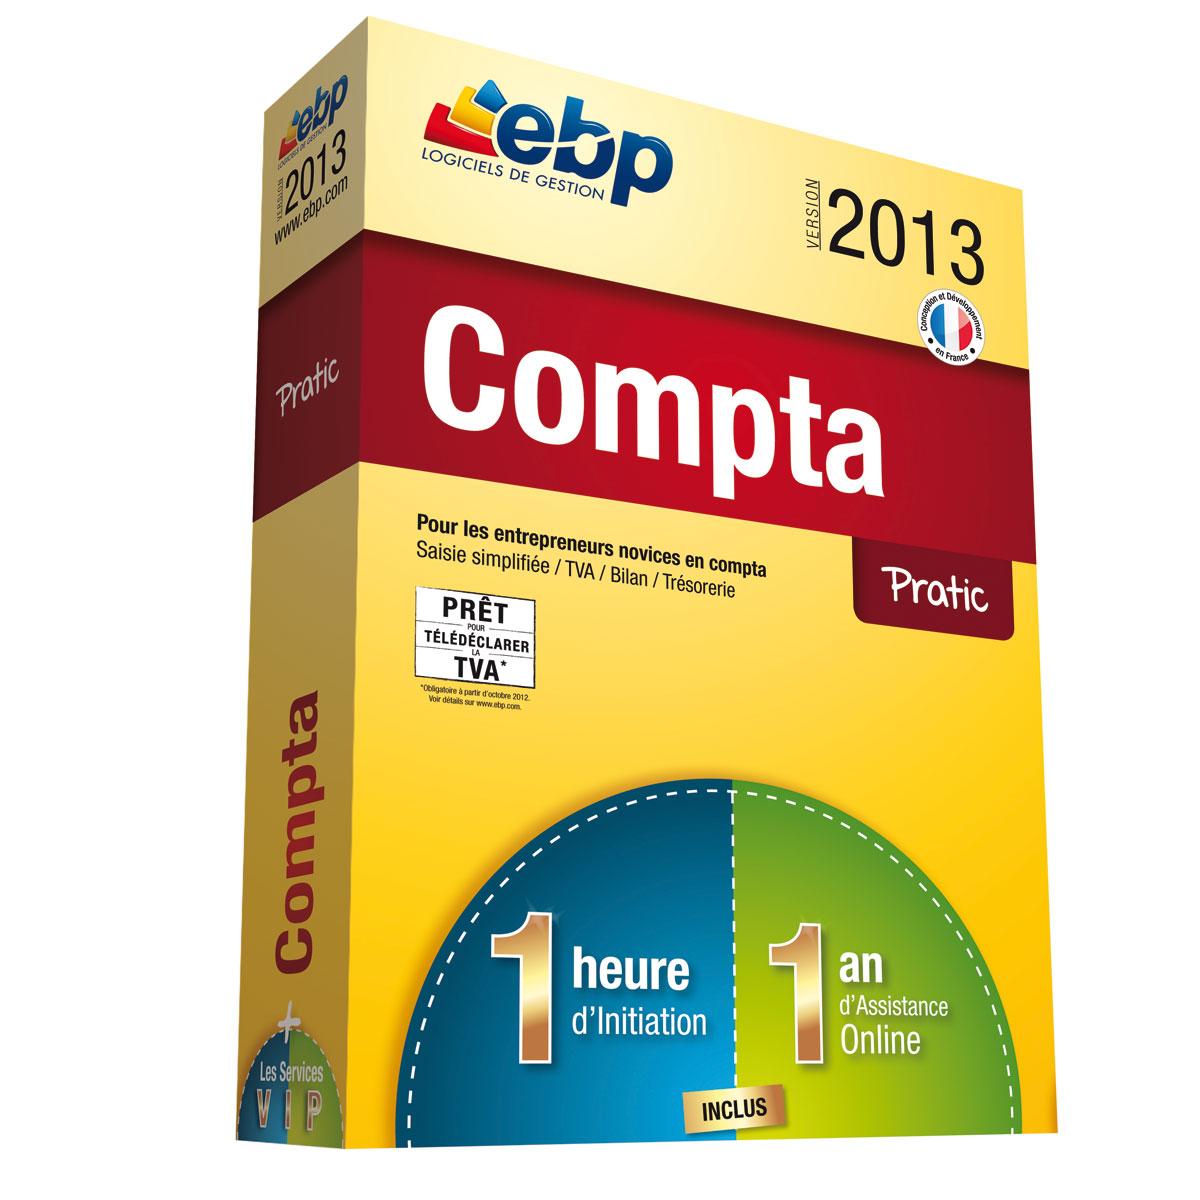 Ebp compta pratic open line 2013 services vip logiciel - Materiel de bureau comptabilite ...